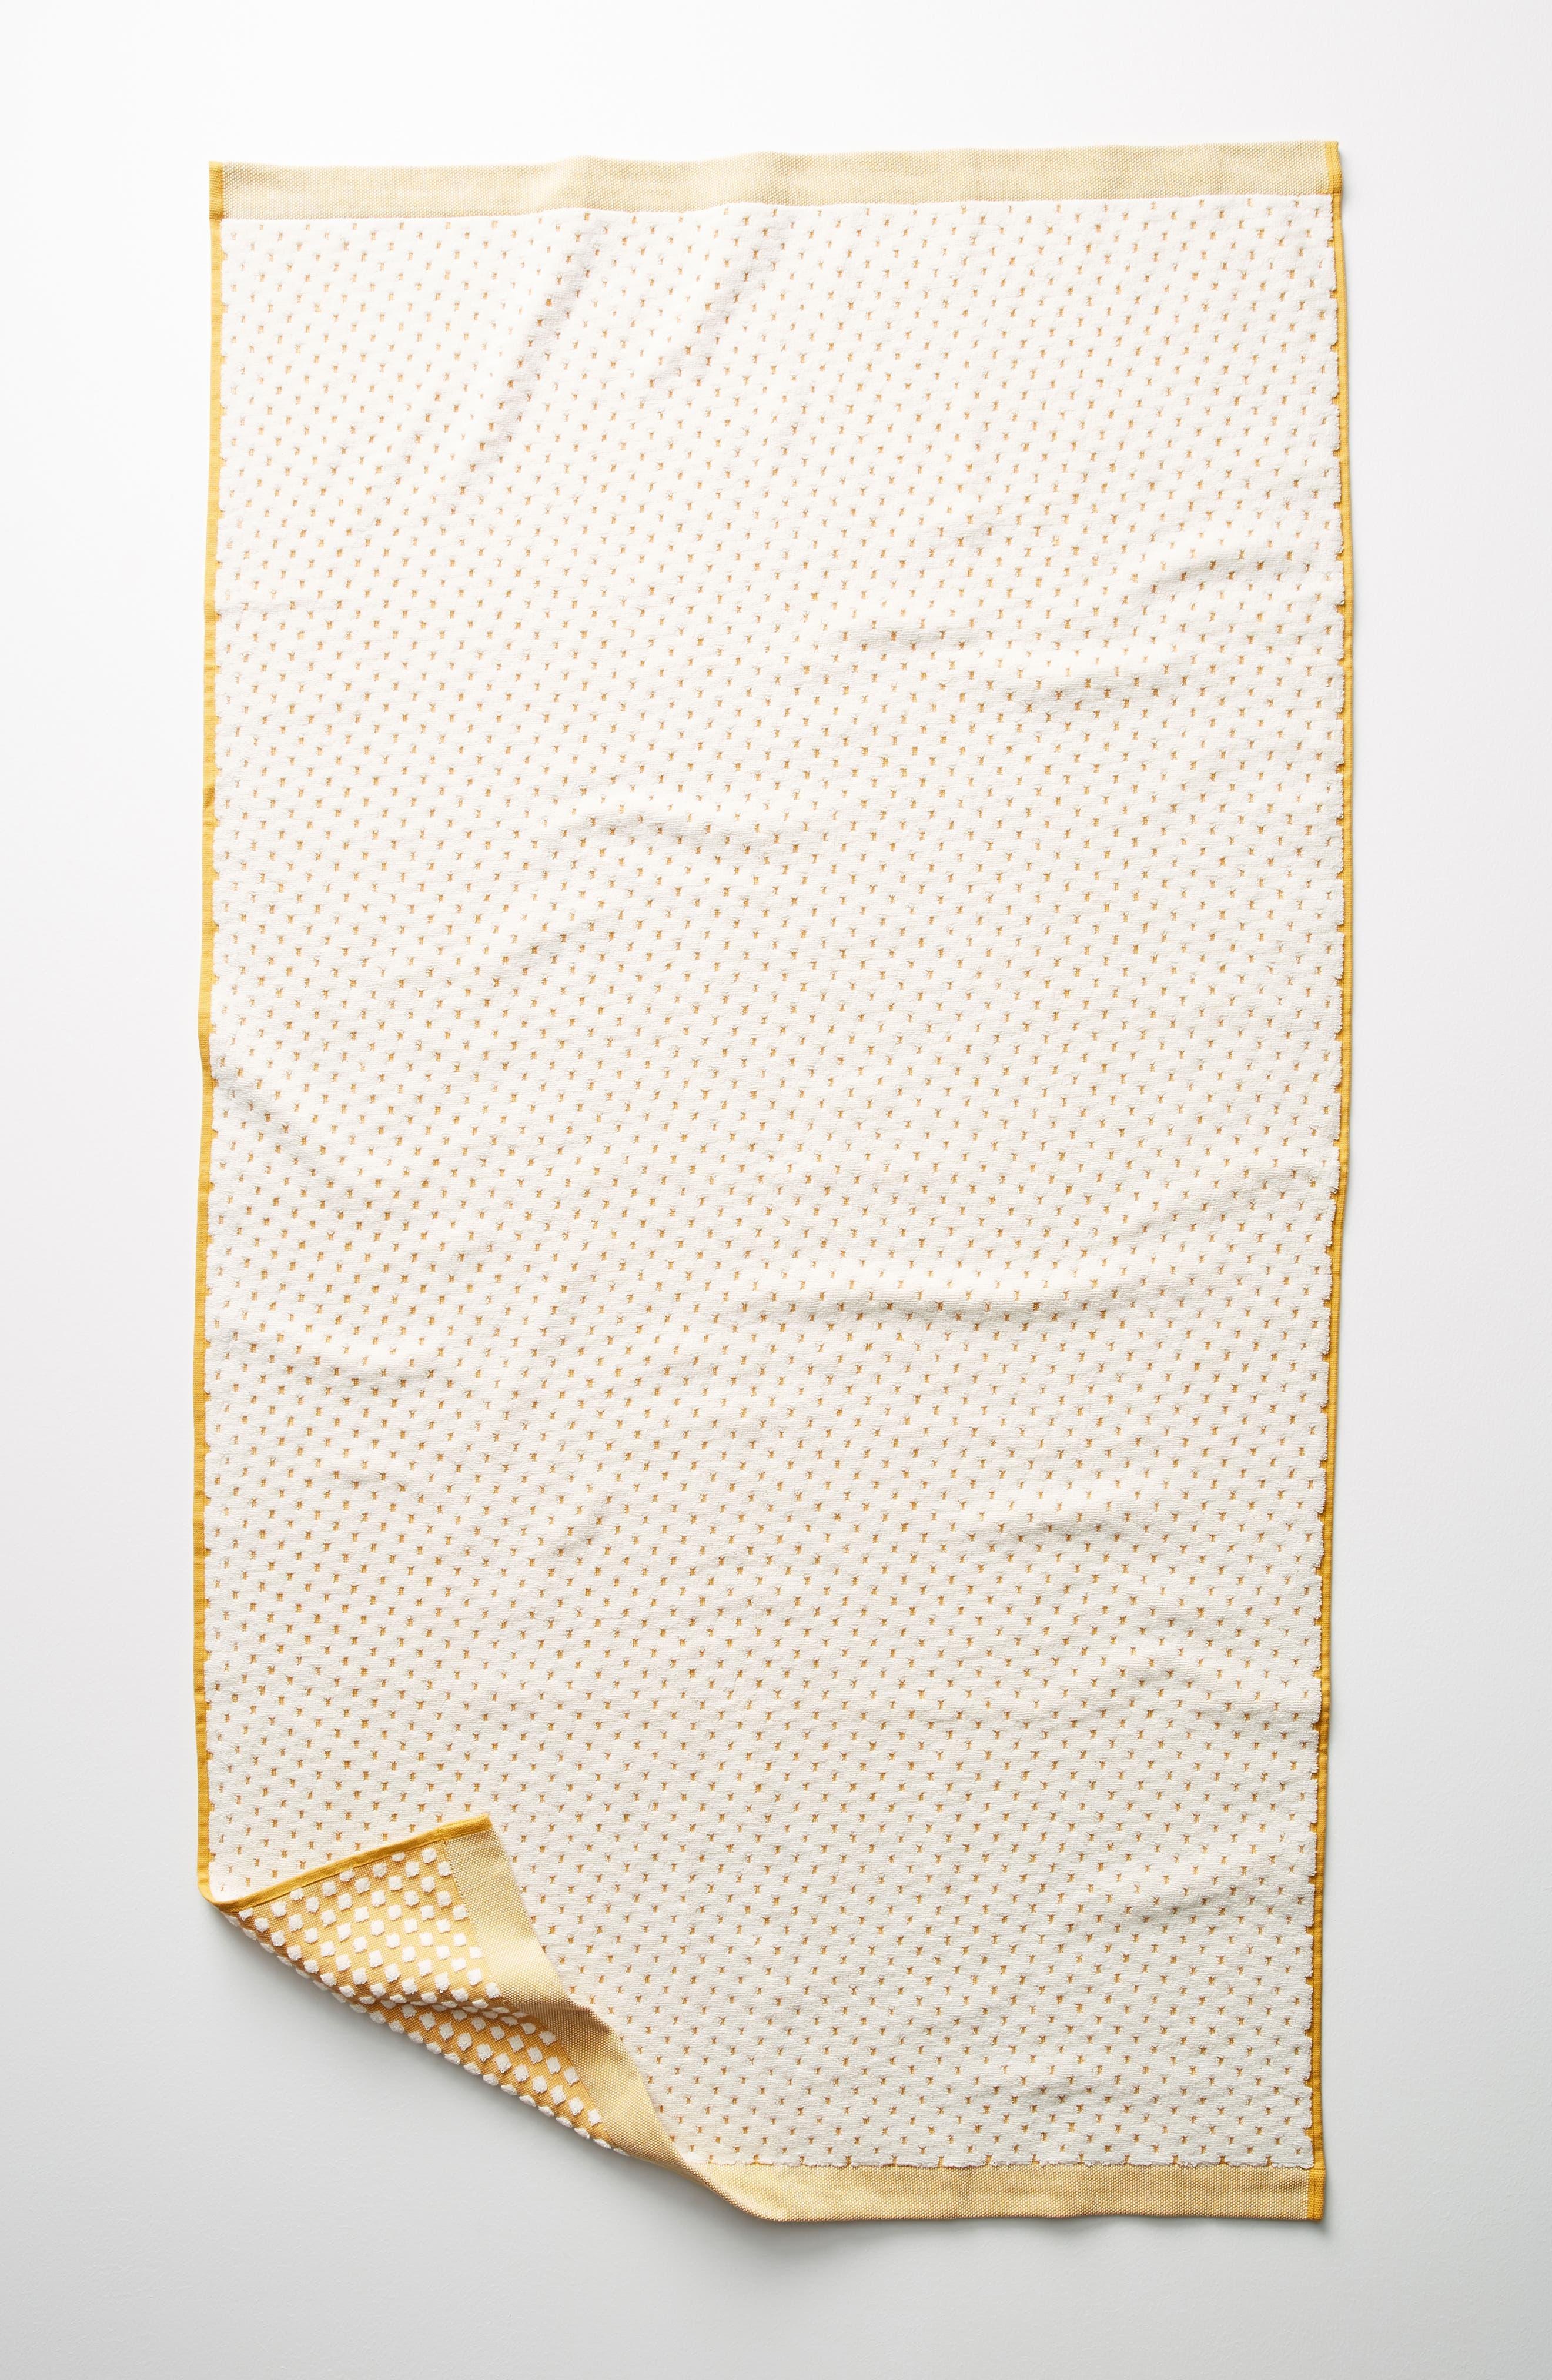 Dot Jacquard Bath Towel,                             Main thumbnail 1, color,                             Ochre